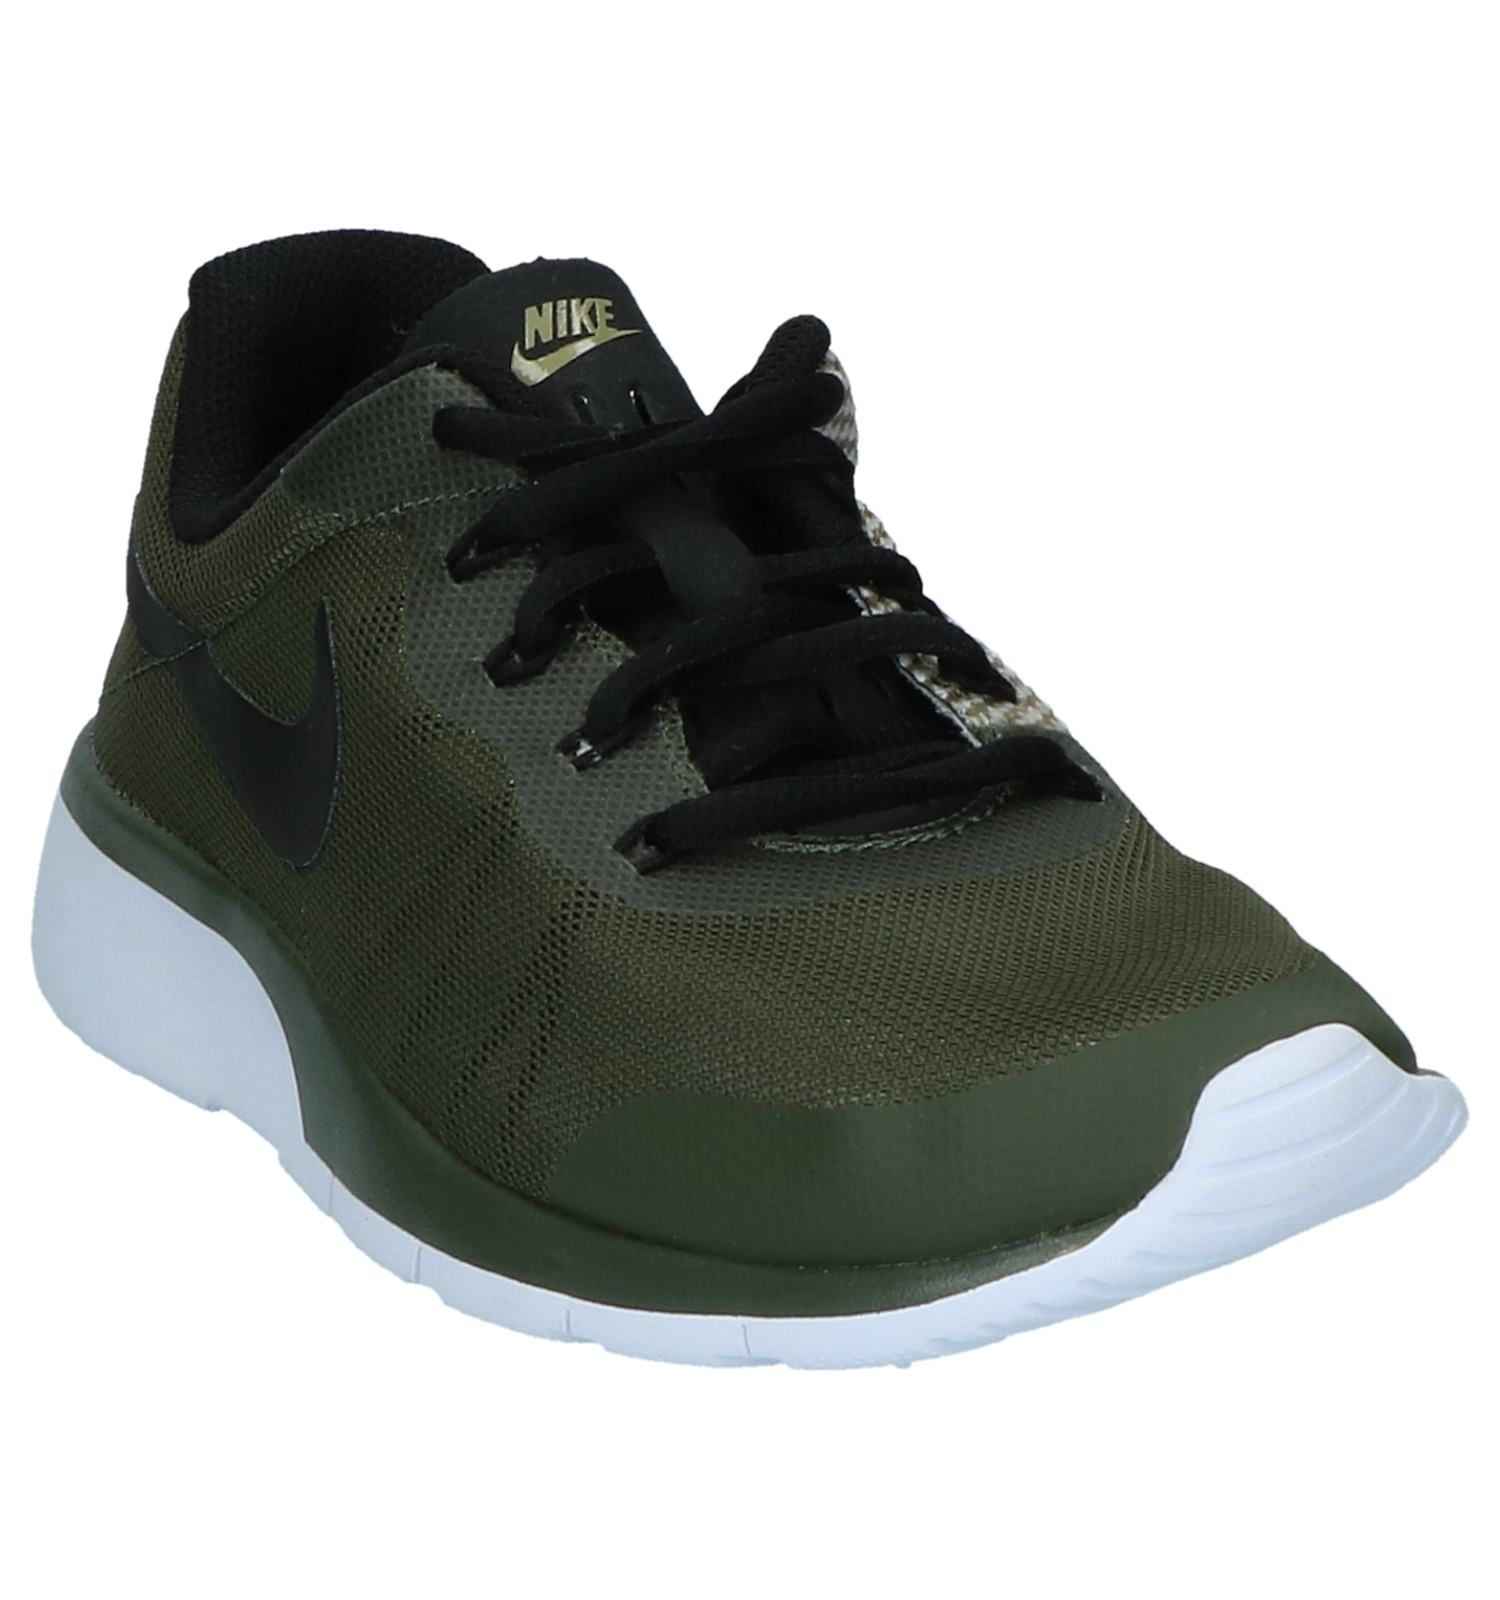 f860377522e Kaki Runner Sneakers Nike Tanjun Racer GS | TORFS.BE | Gratis verzend en  retour